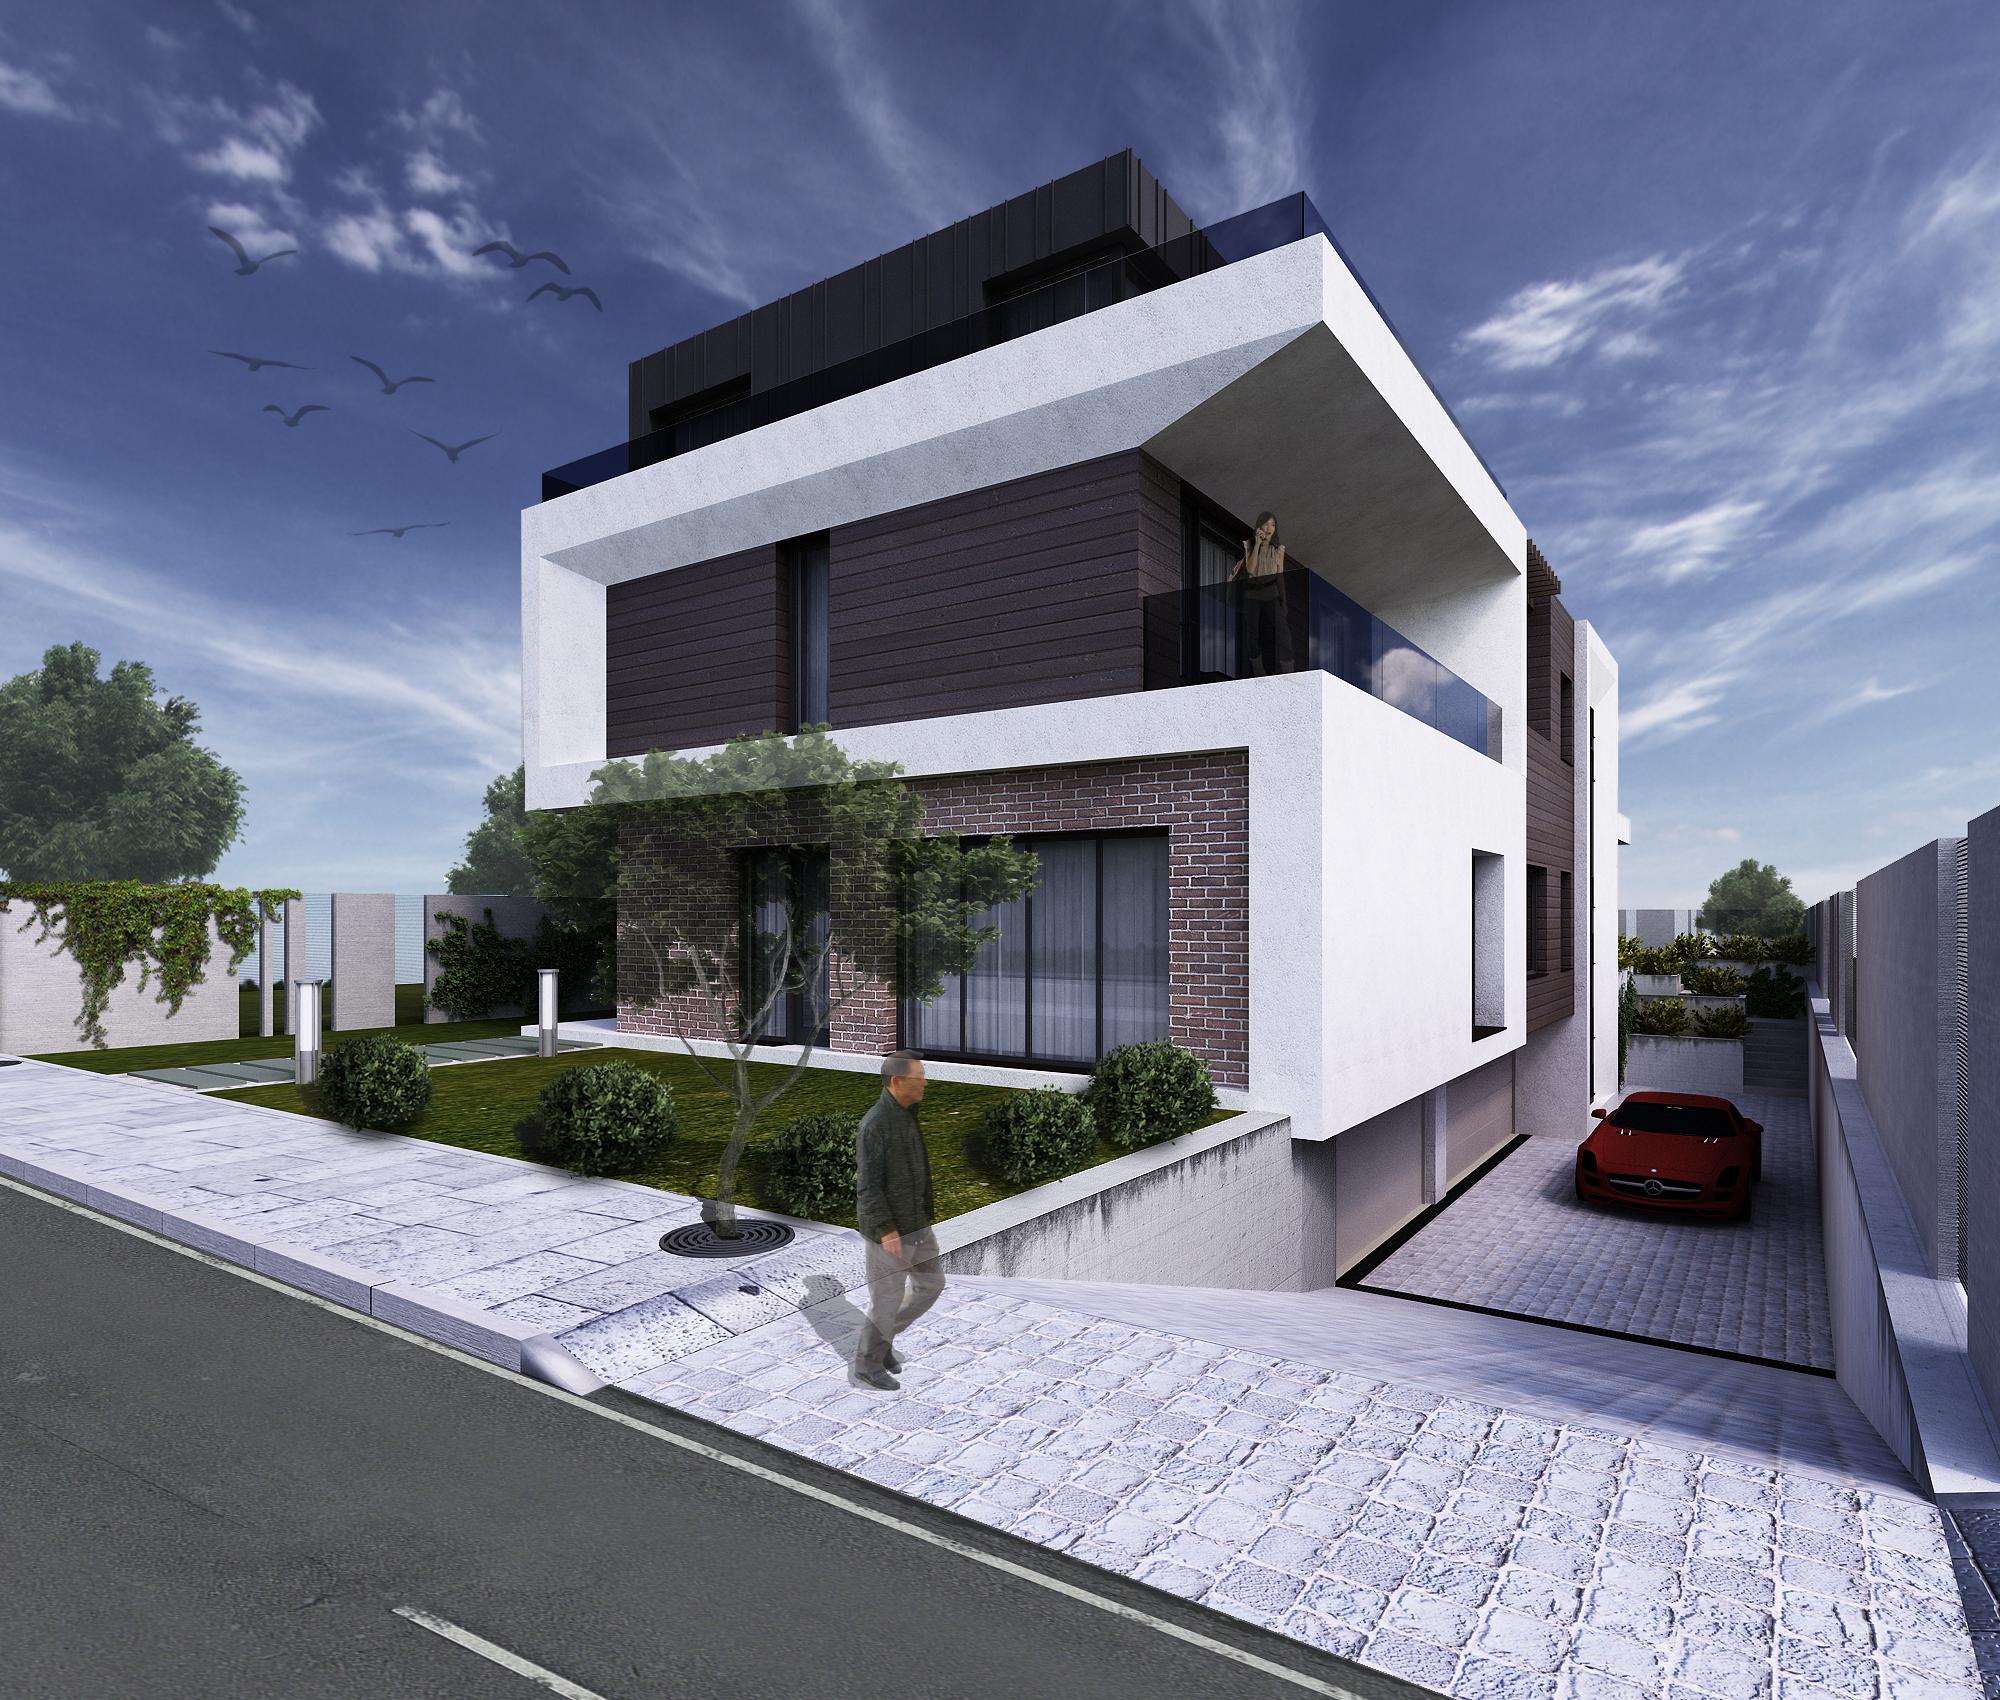 Proiectare casa cu 2 unitati locative